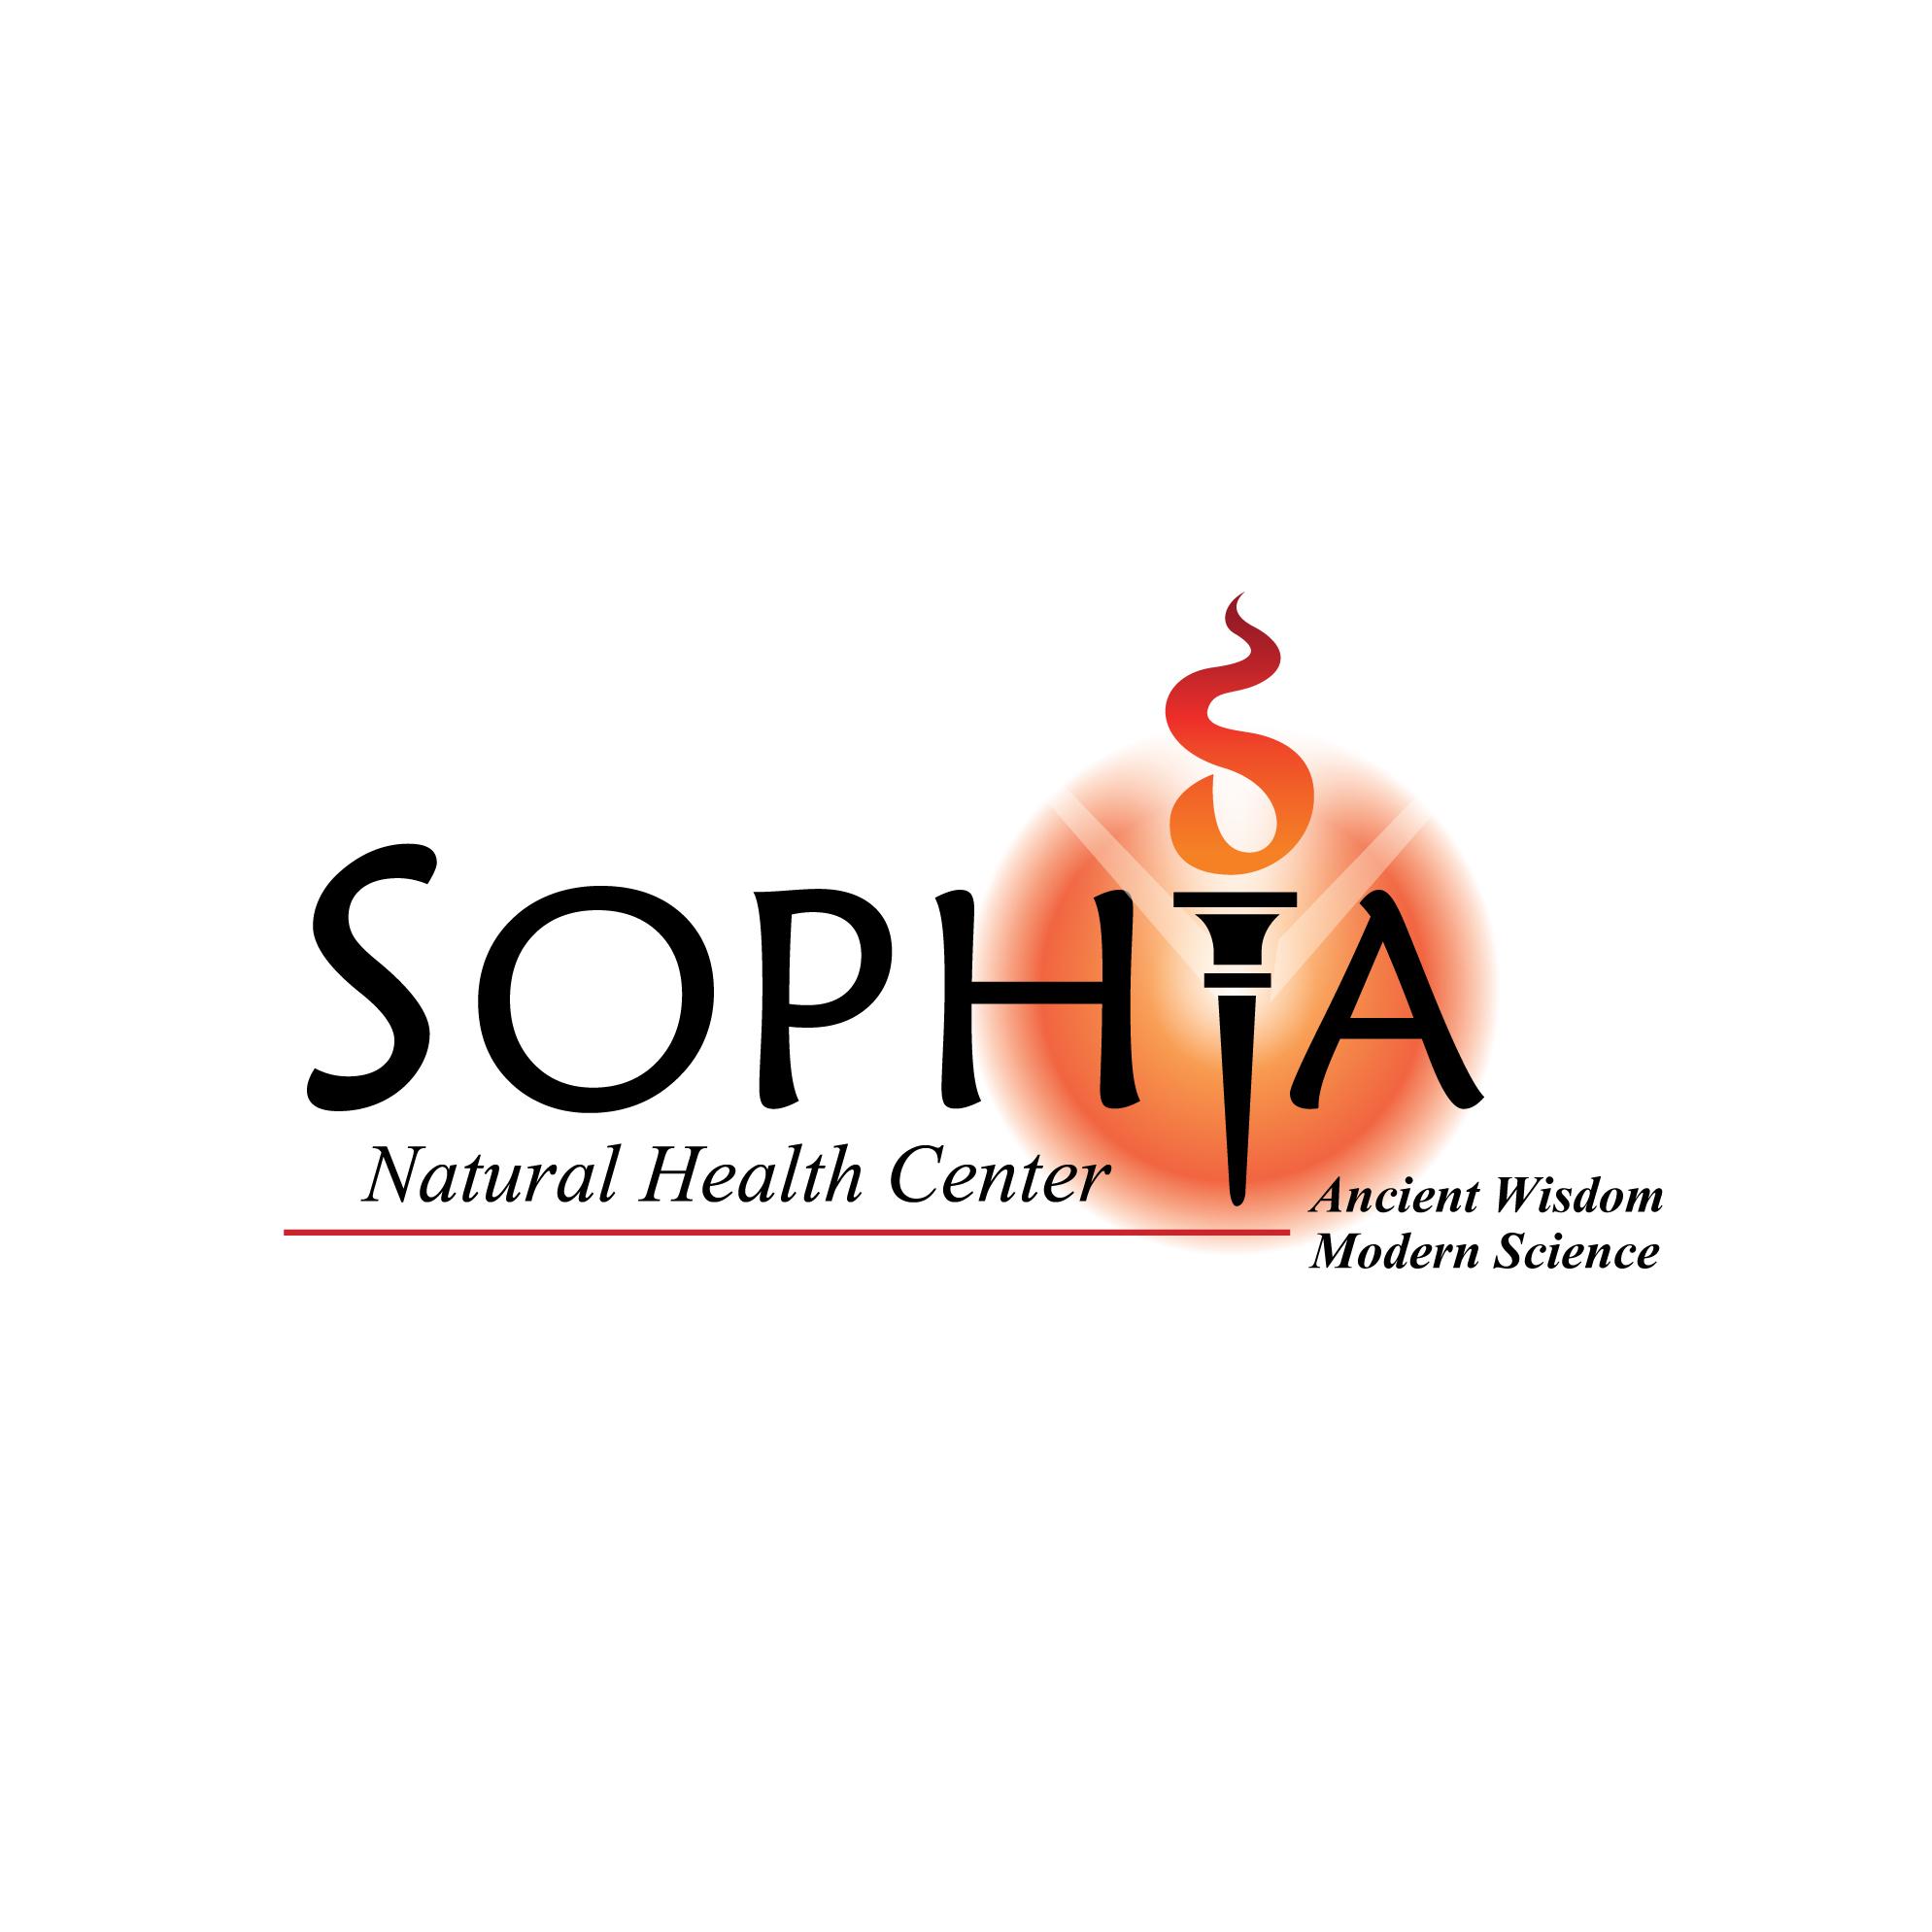 Sophia Natural Health Center - Integrative Natural Medicine image 3